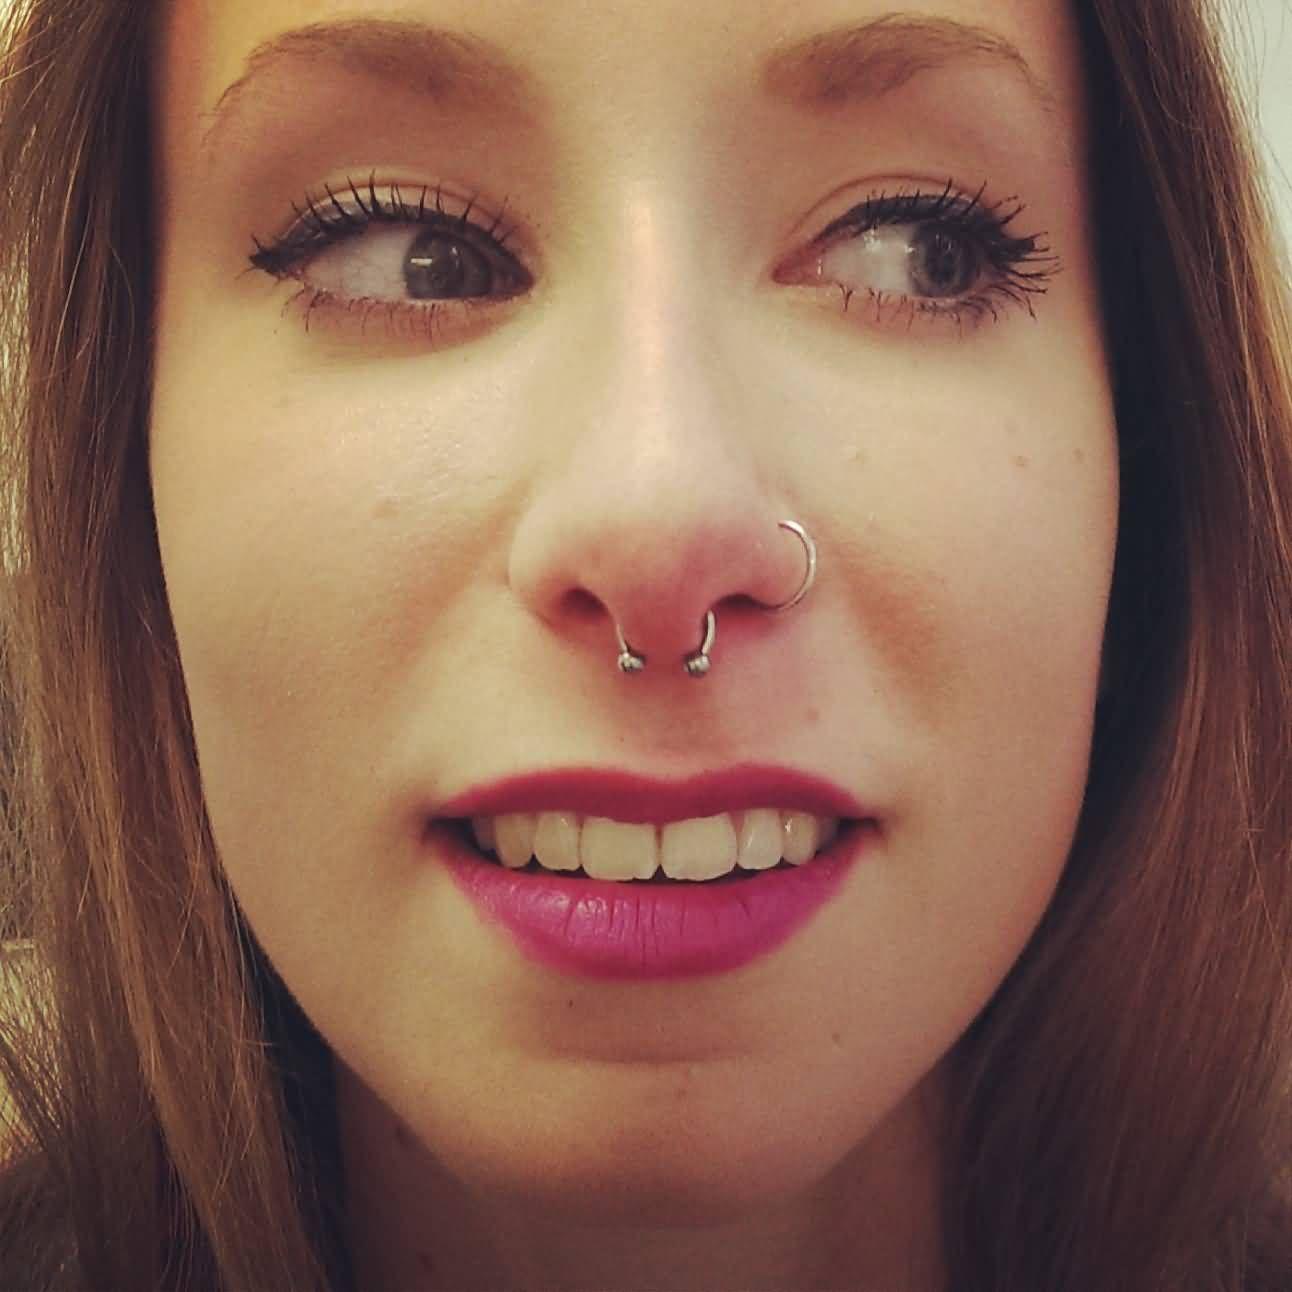 Left Nostril And Septum Piercing Septum Piercing Black Girl